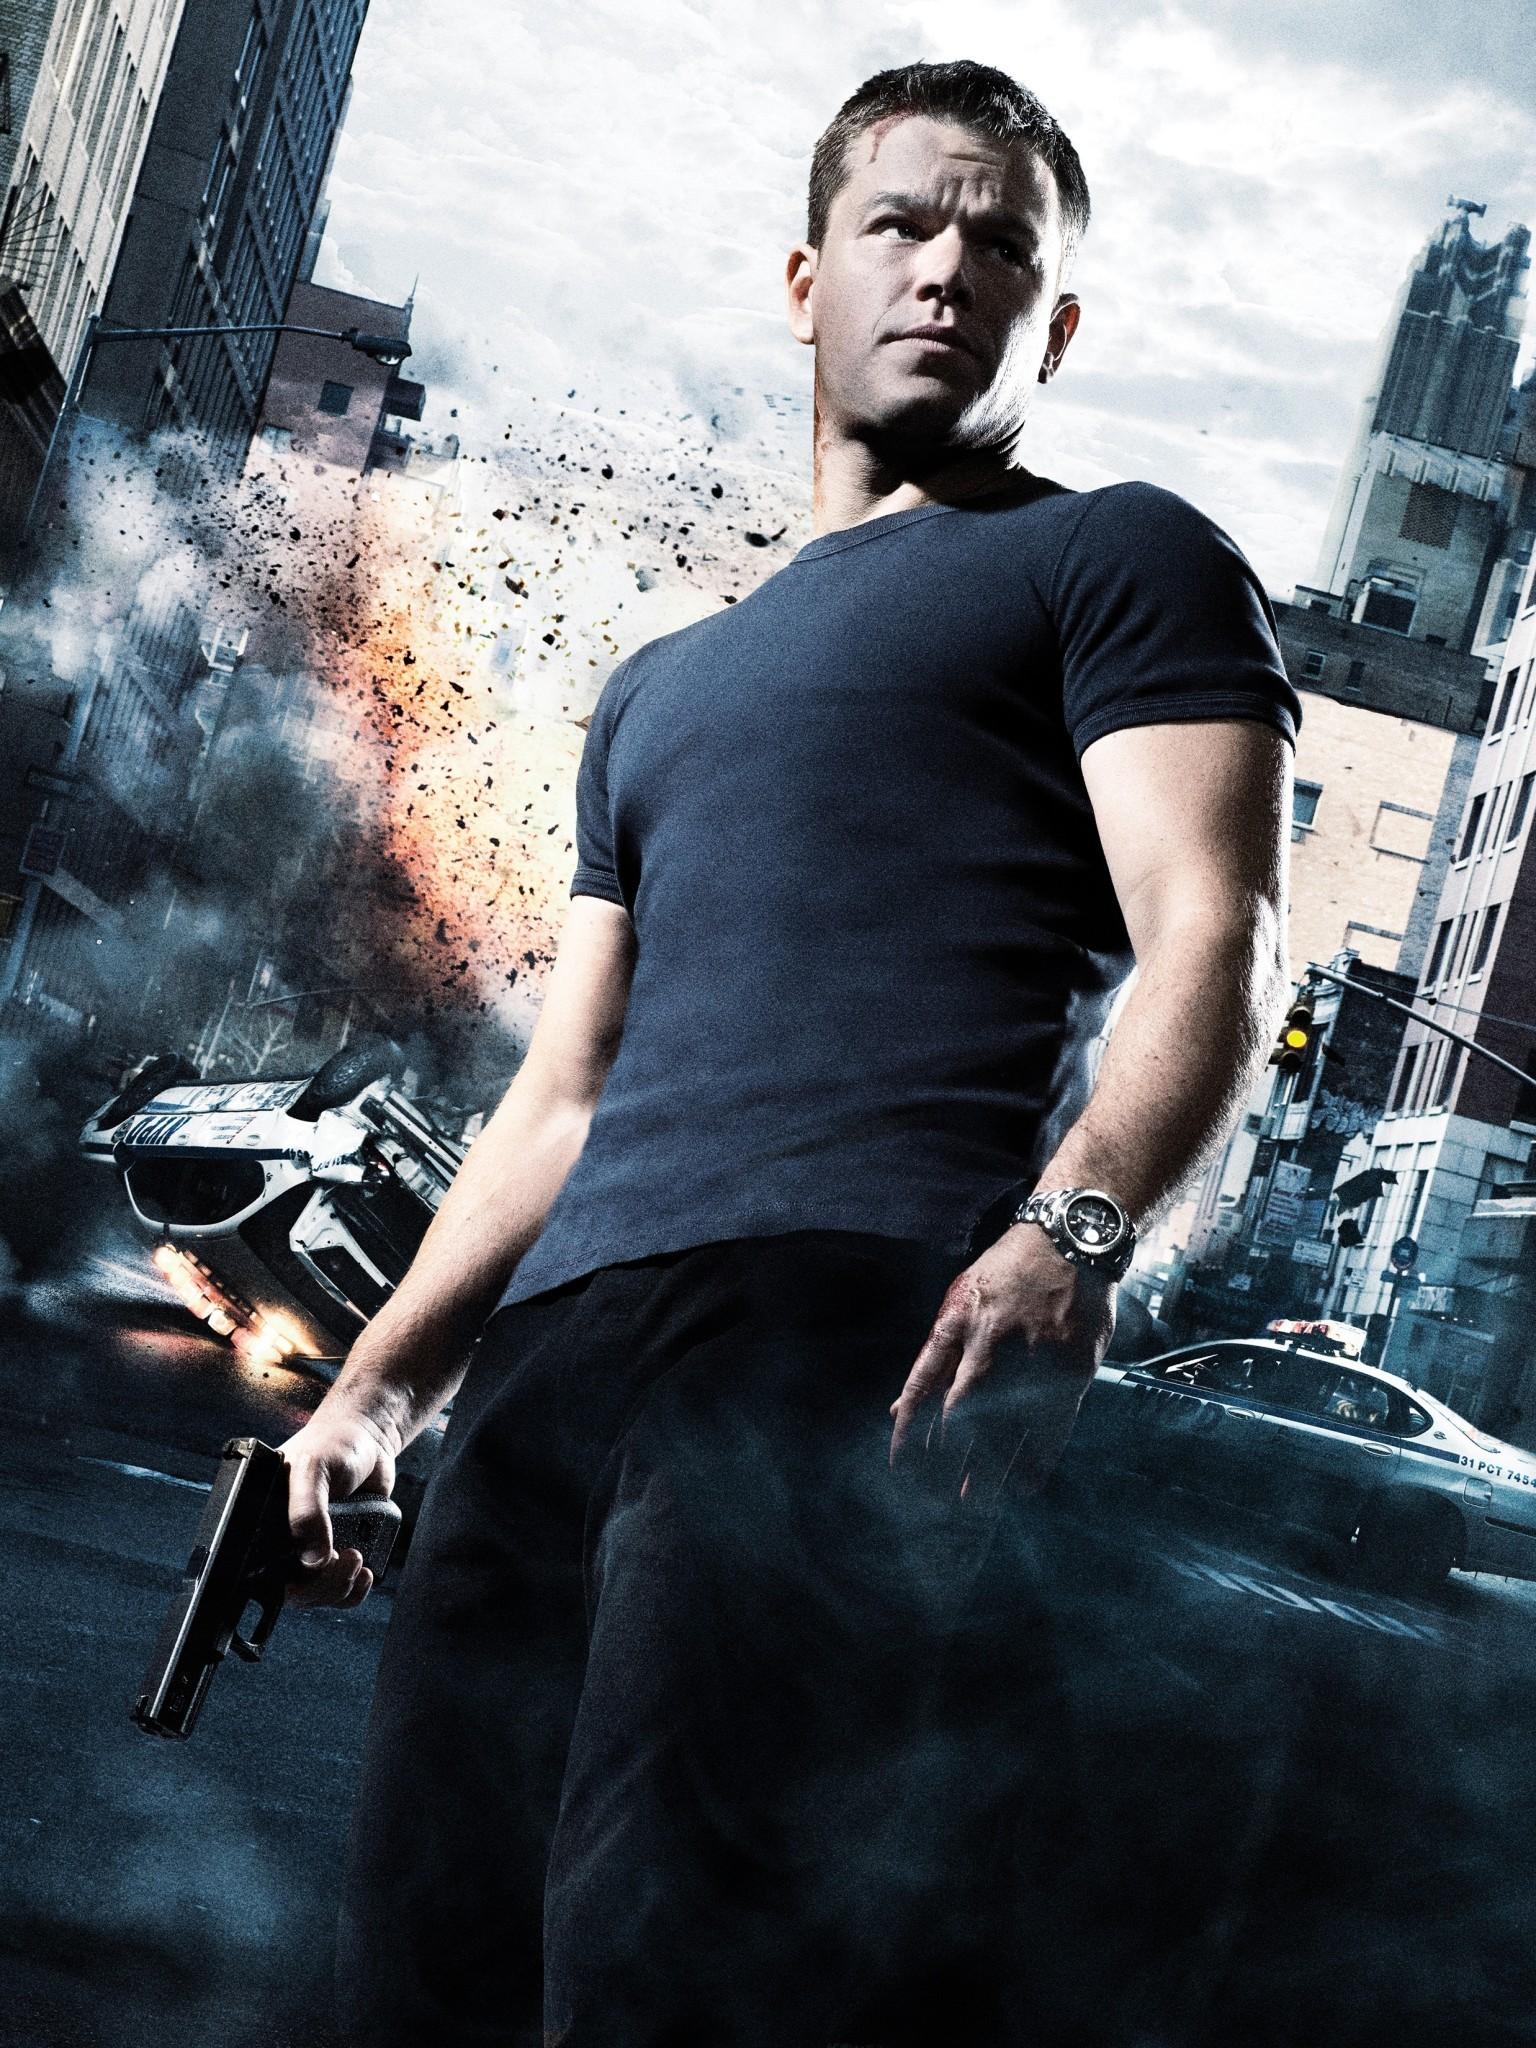 Res: 1536x2048, The Bourne Ultimatum, Matt Damon, Explosion, Jason Bourne